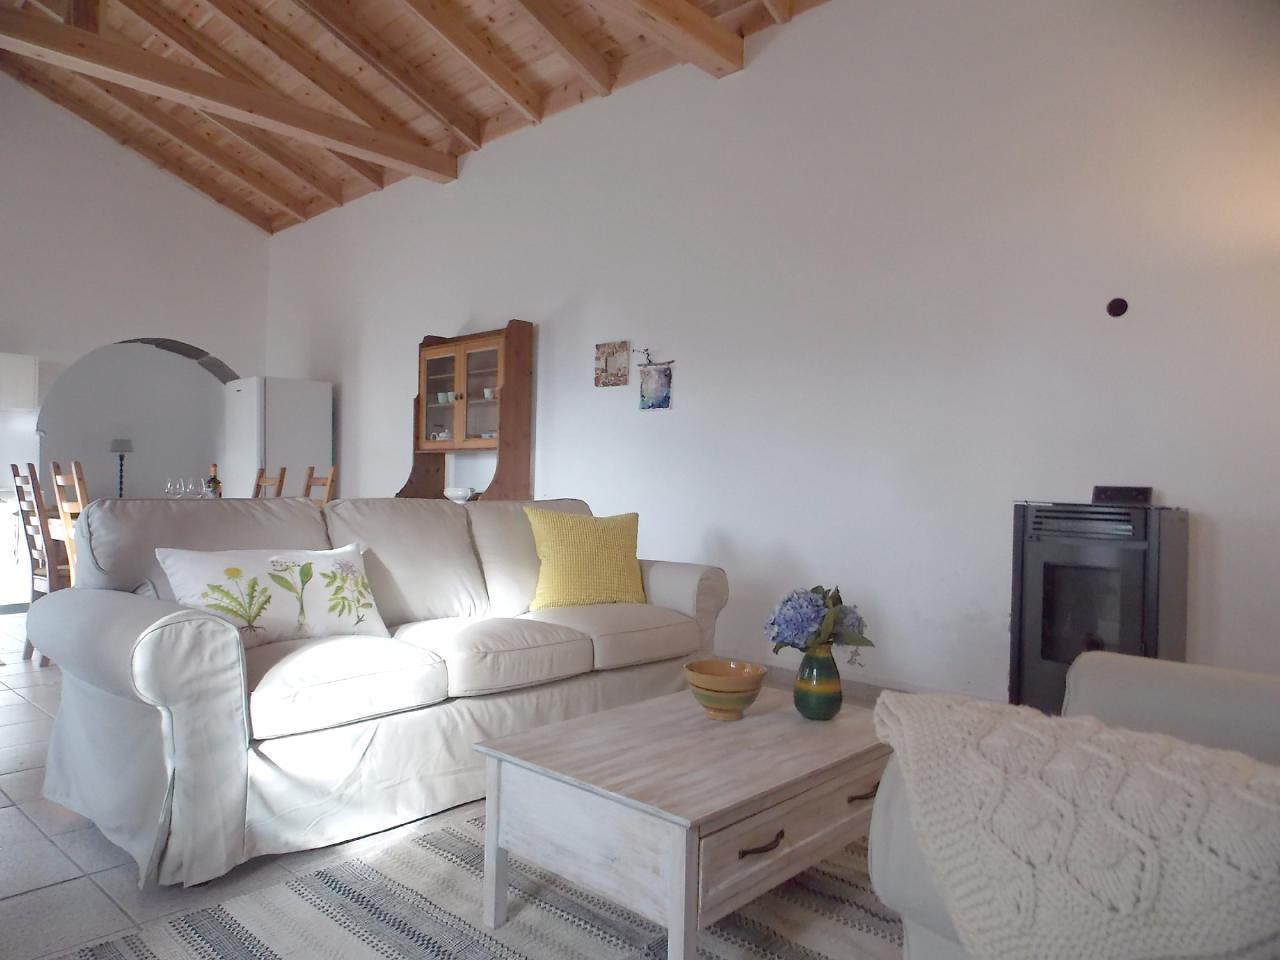 Ferienhaus Casa Bouganvillea (2074452), Ginetes, Sao Miguel, Azoren, Portugal, Bild 3